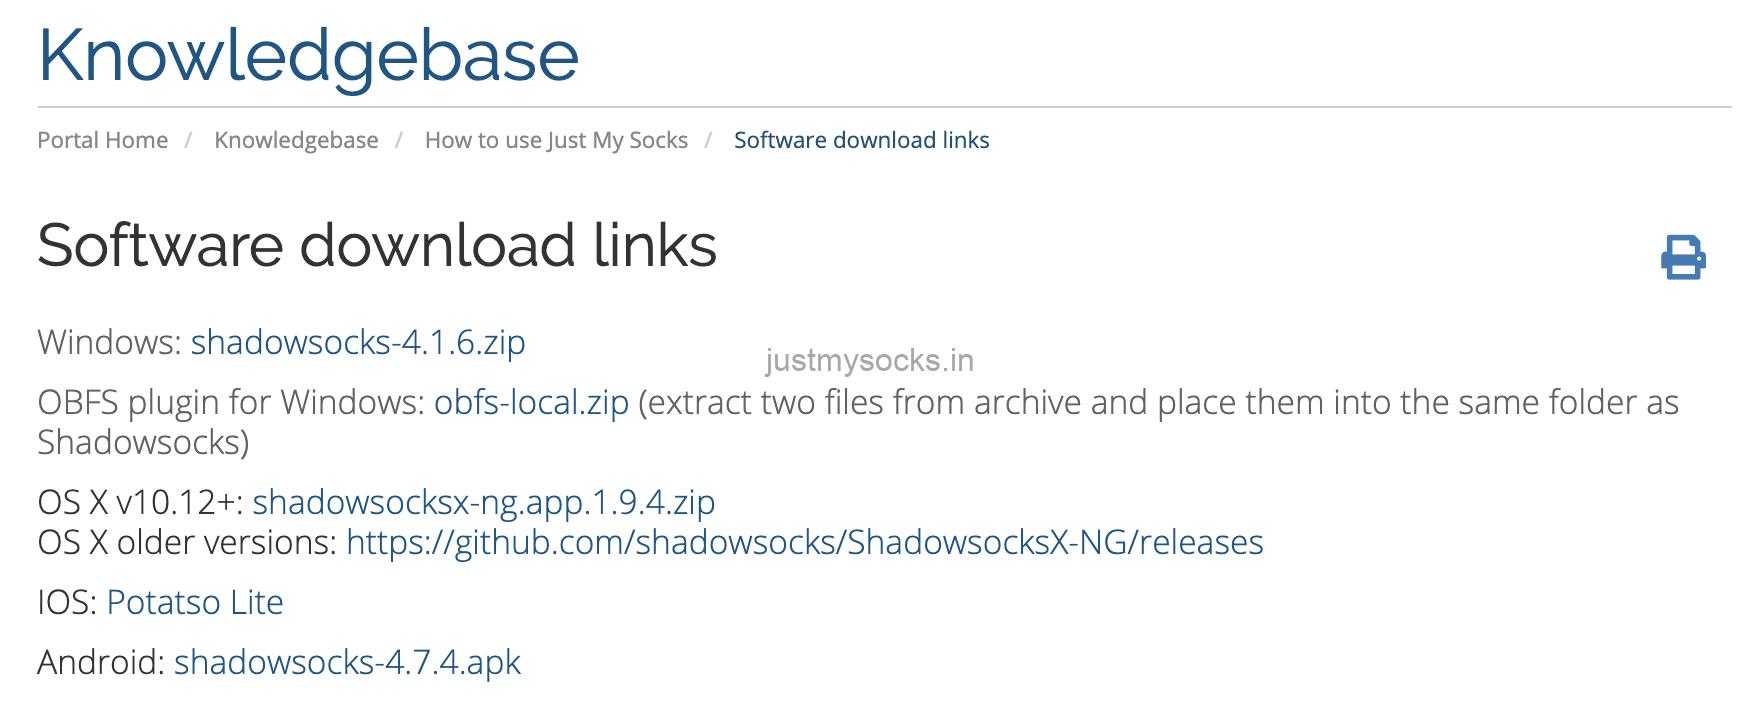 justmysocks software download